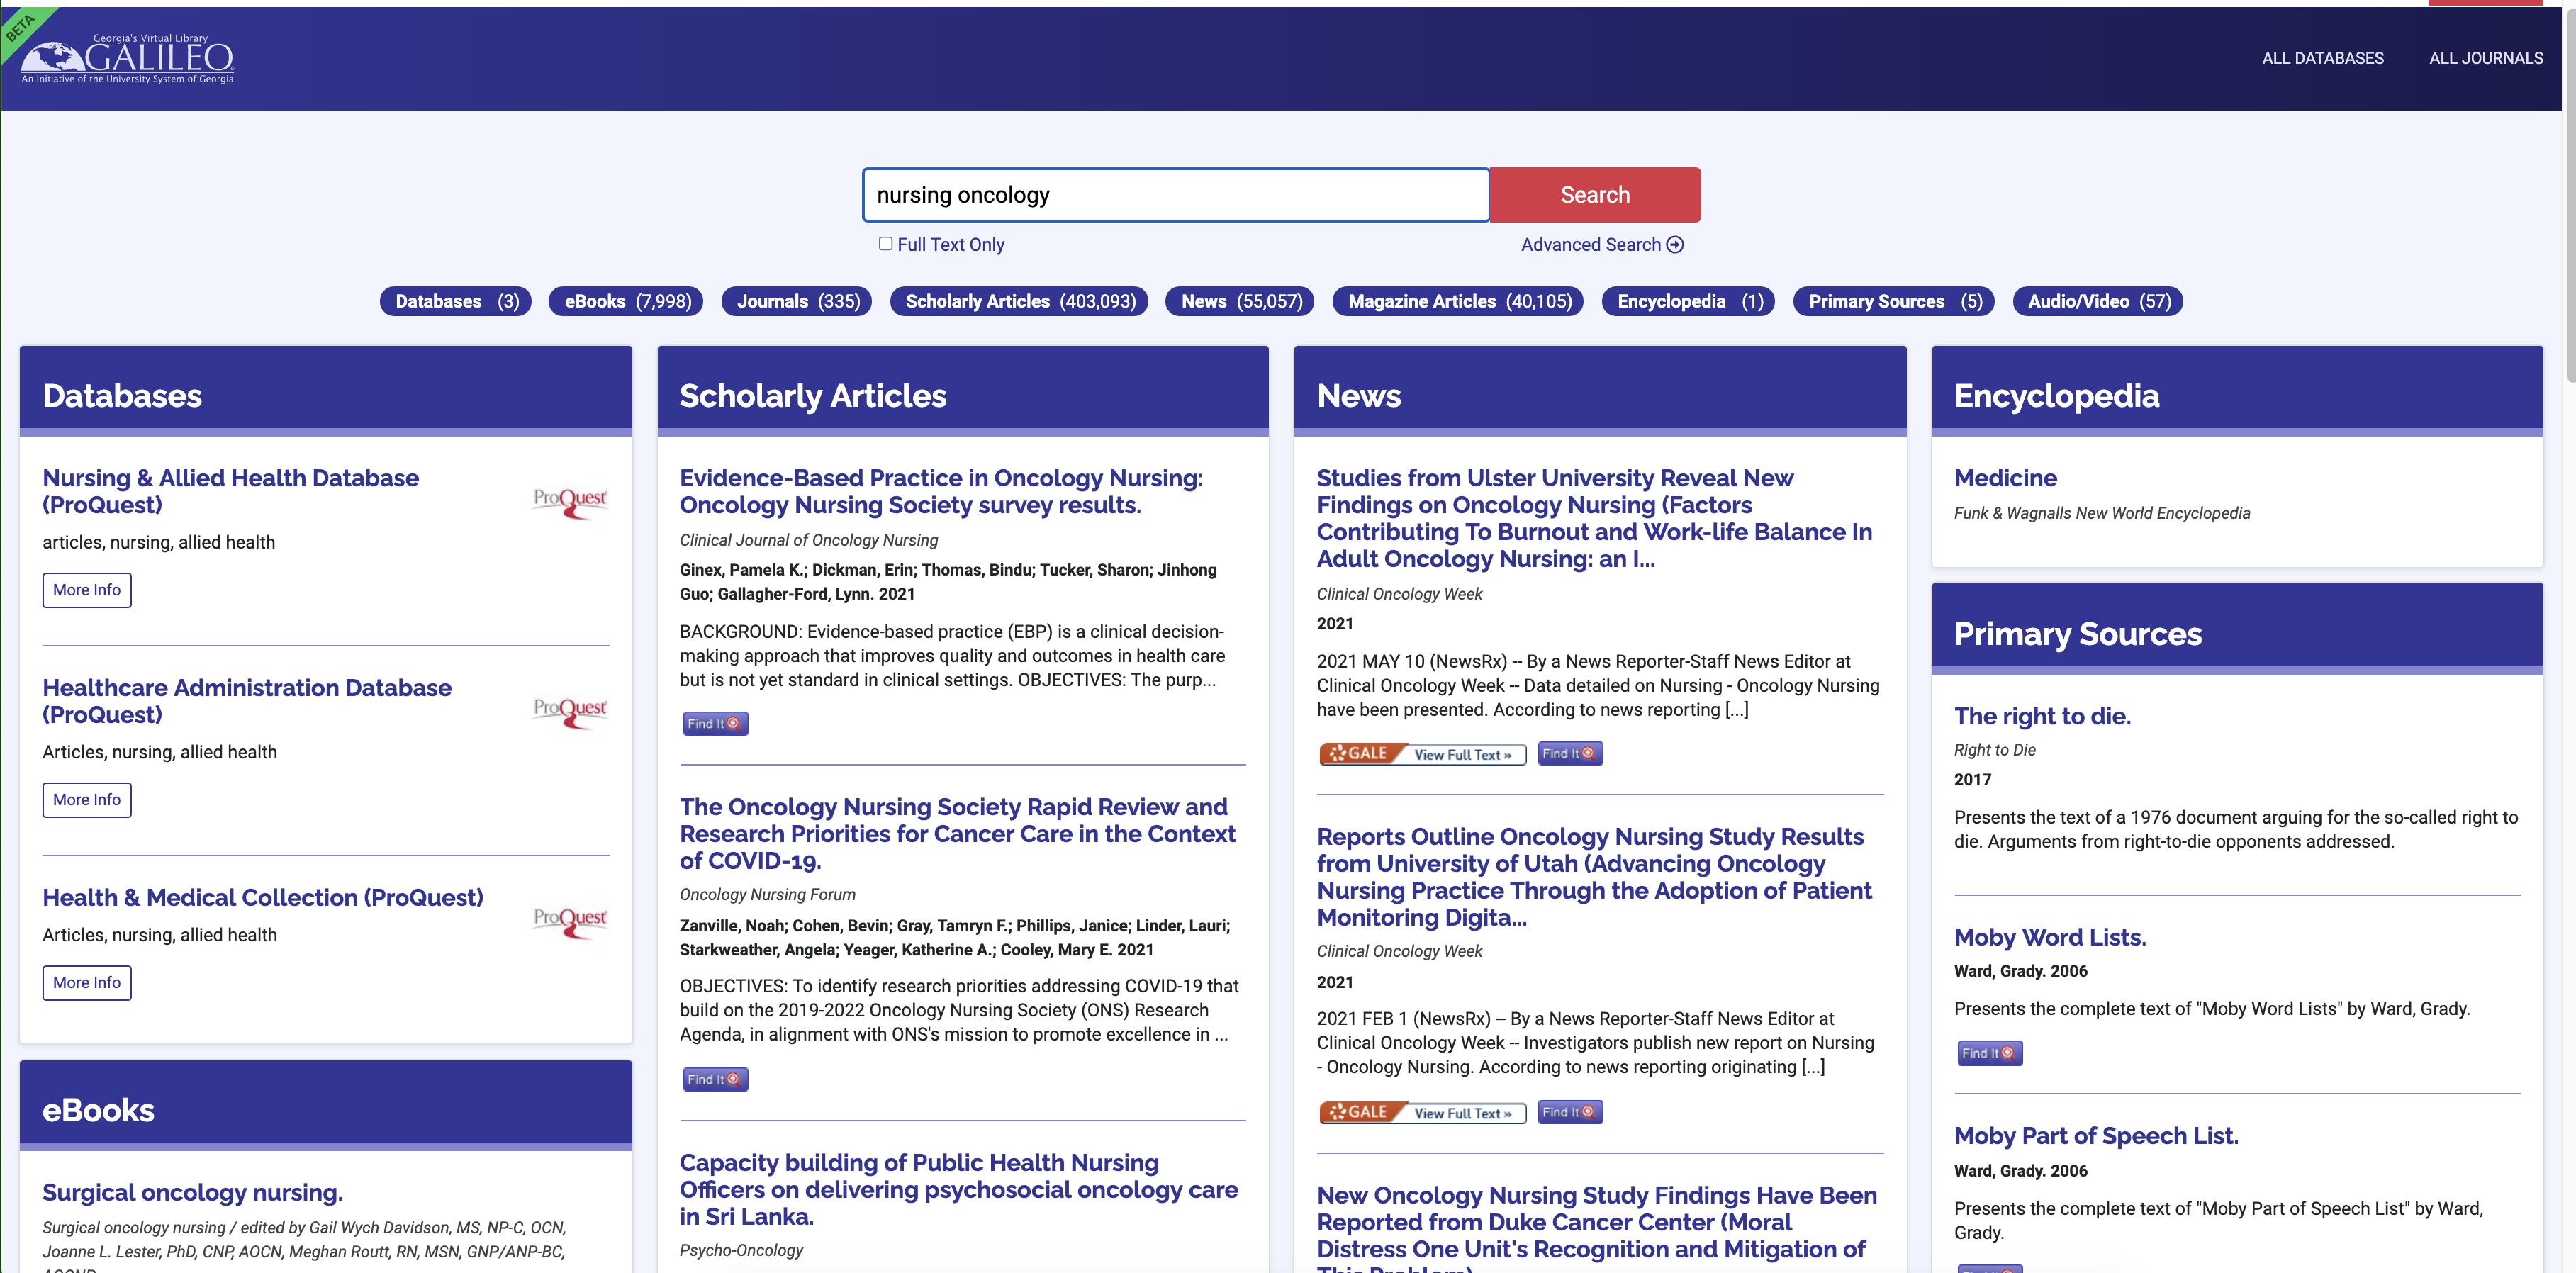 Screenshot of new GALILEO homepage